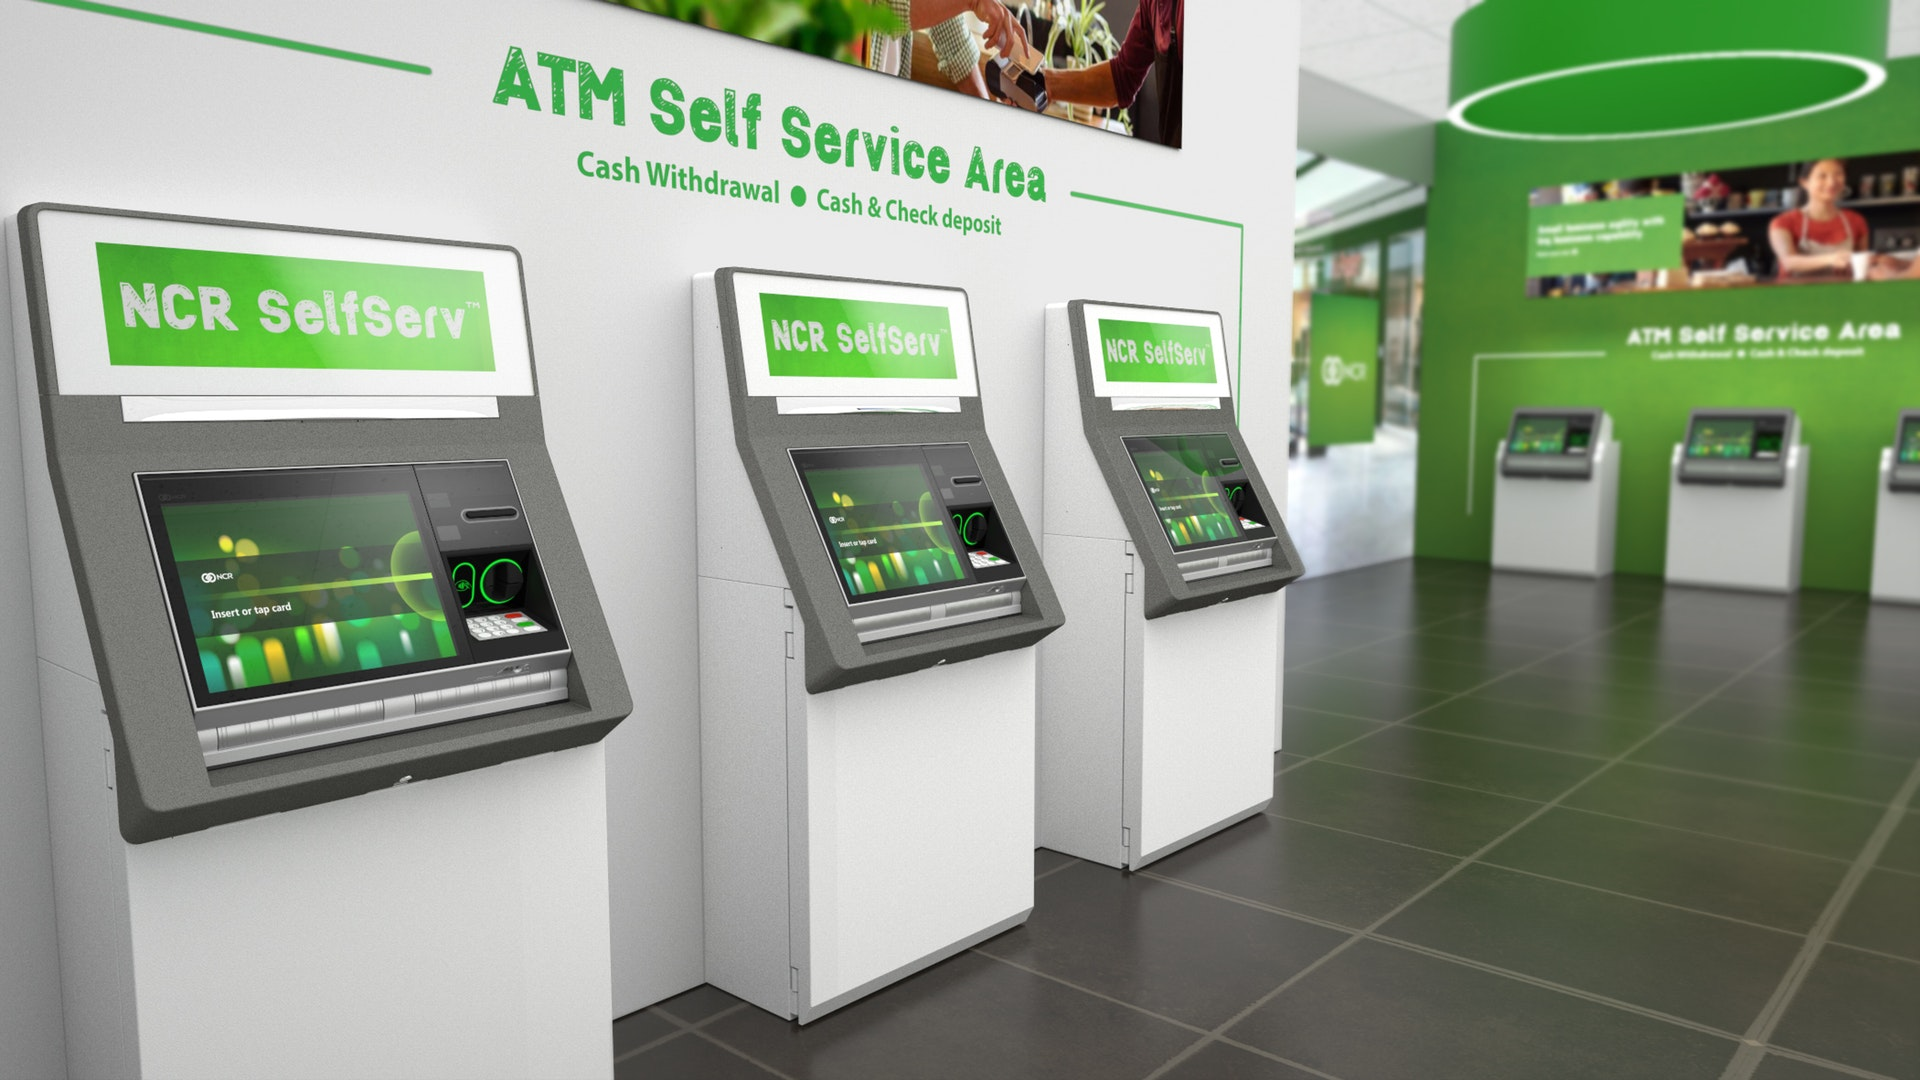 ATM NCR